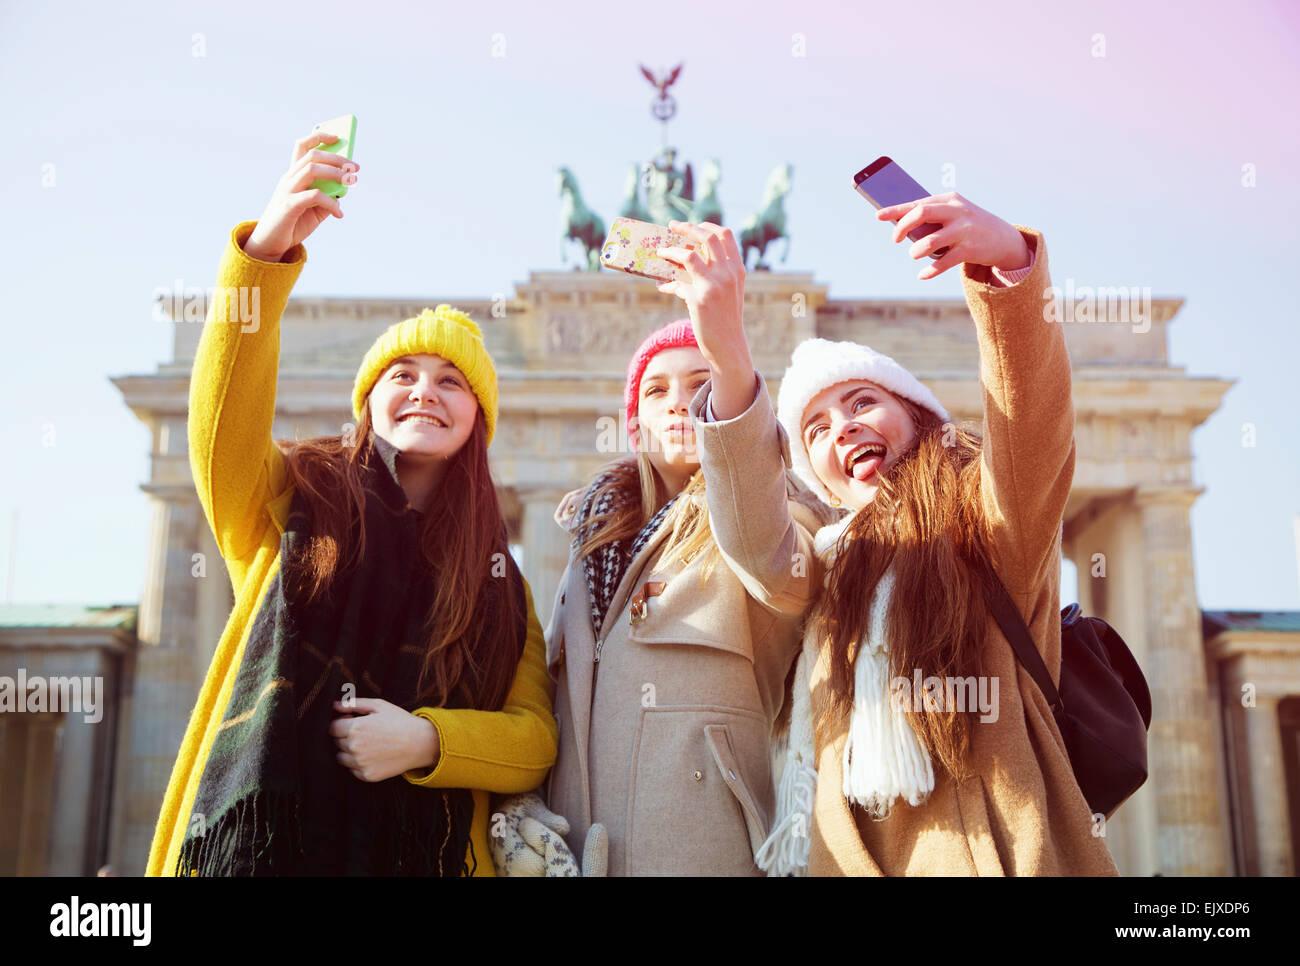 teenage-girls-taking-selfie-in-front-of-